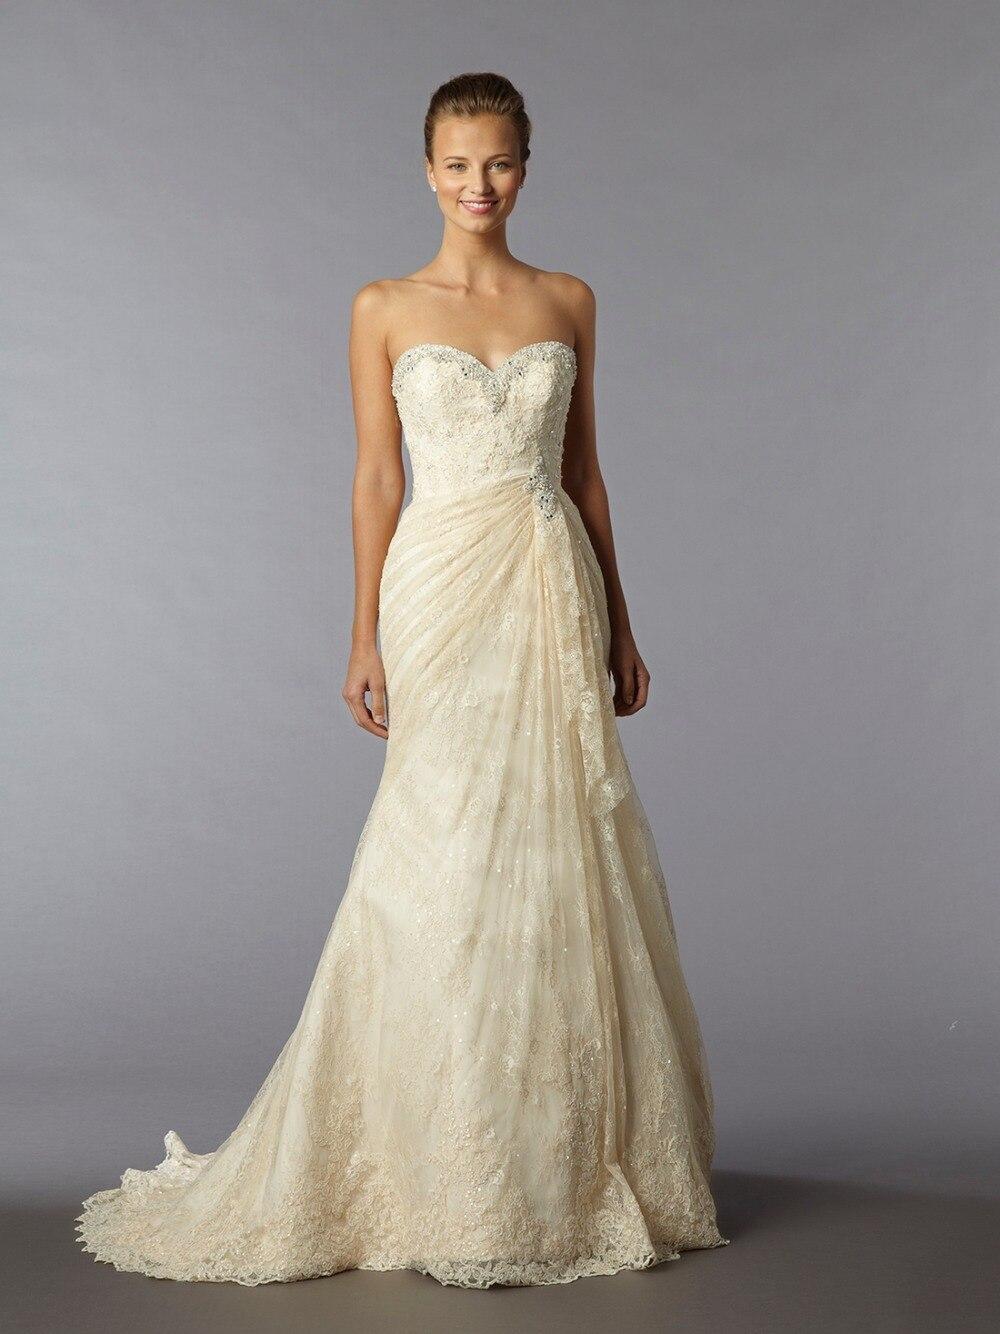 achetez en gros robe de mariage champagne couleur en ligne des grossistes robe de mariage. Black Bedroom Furniture Sets. Home Design Ideas